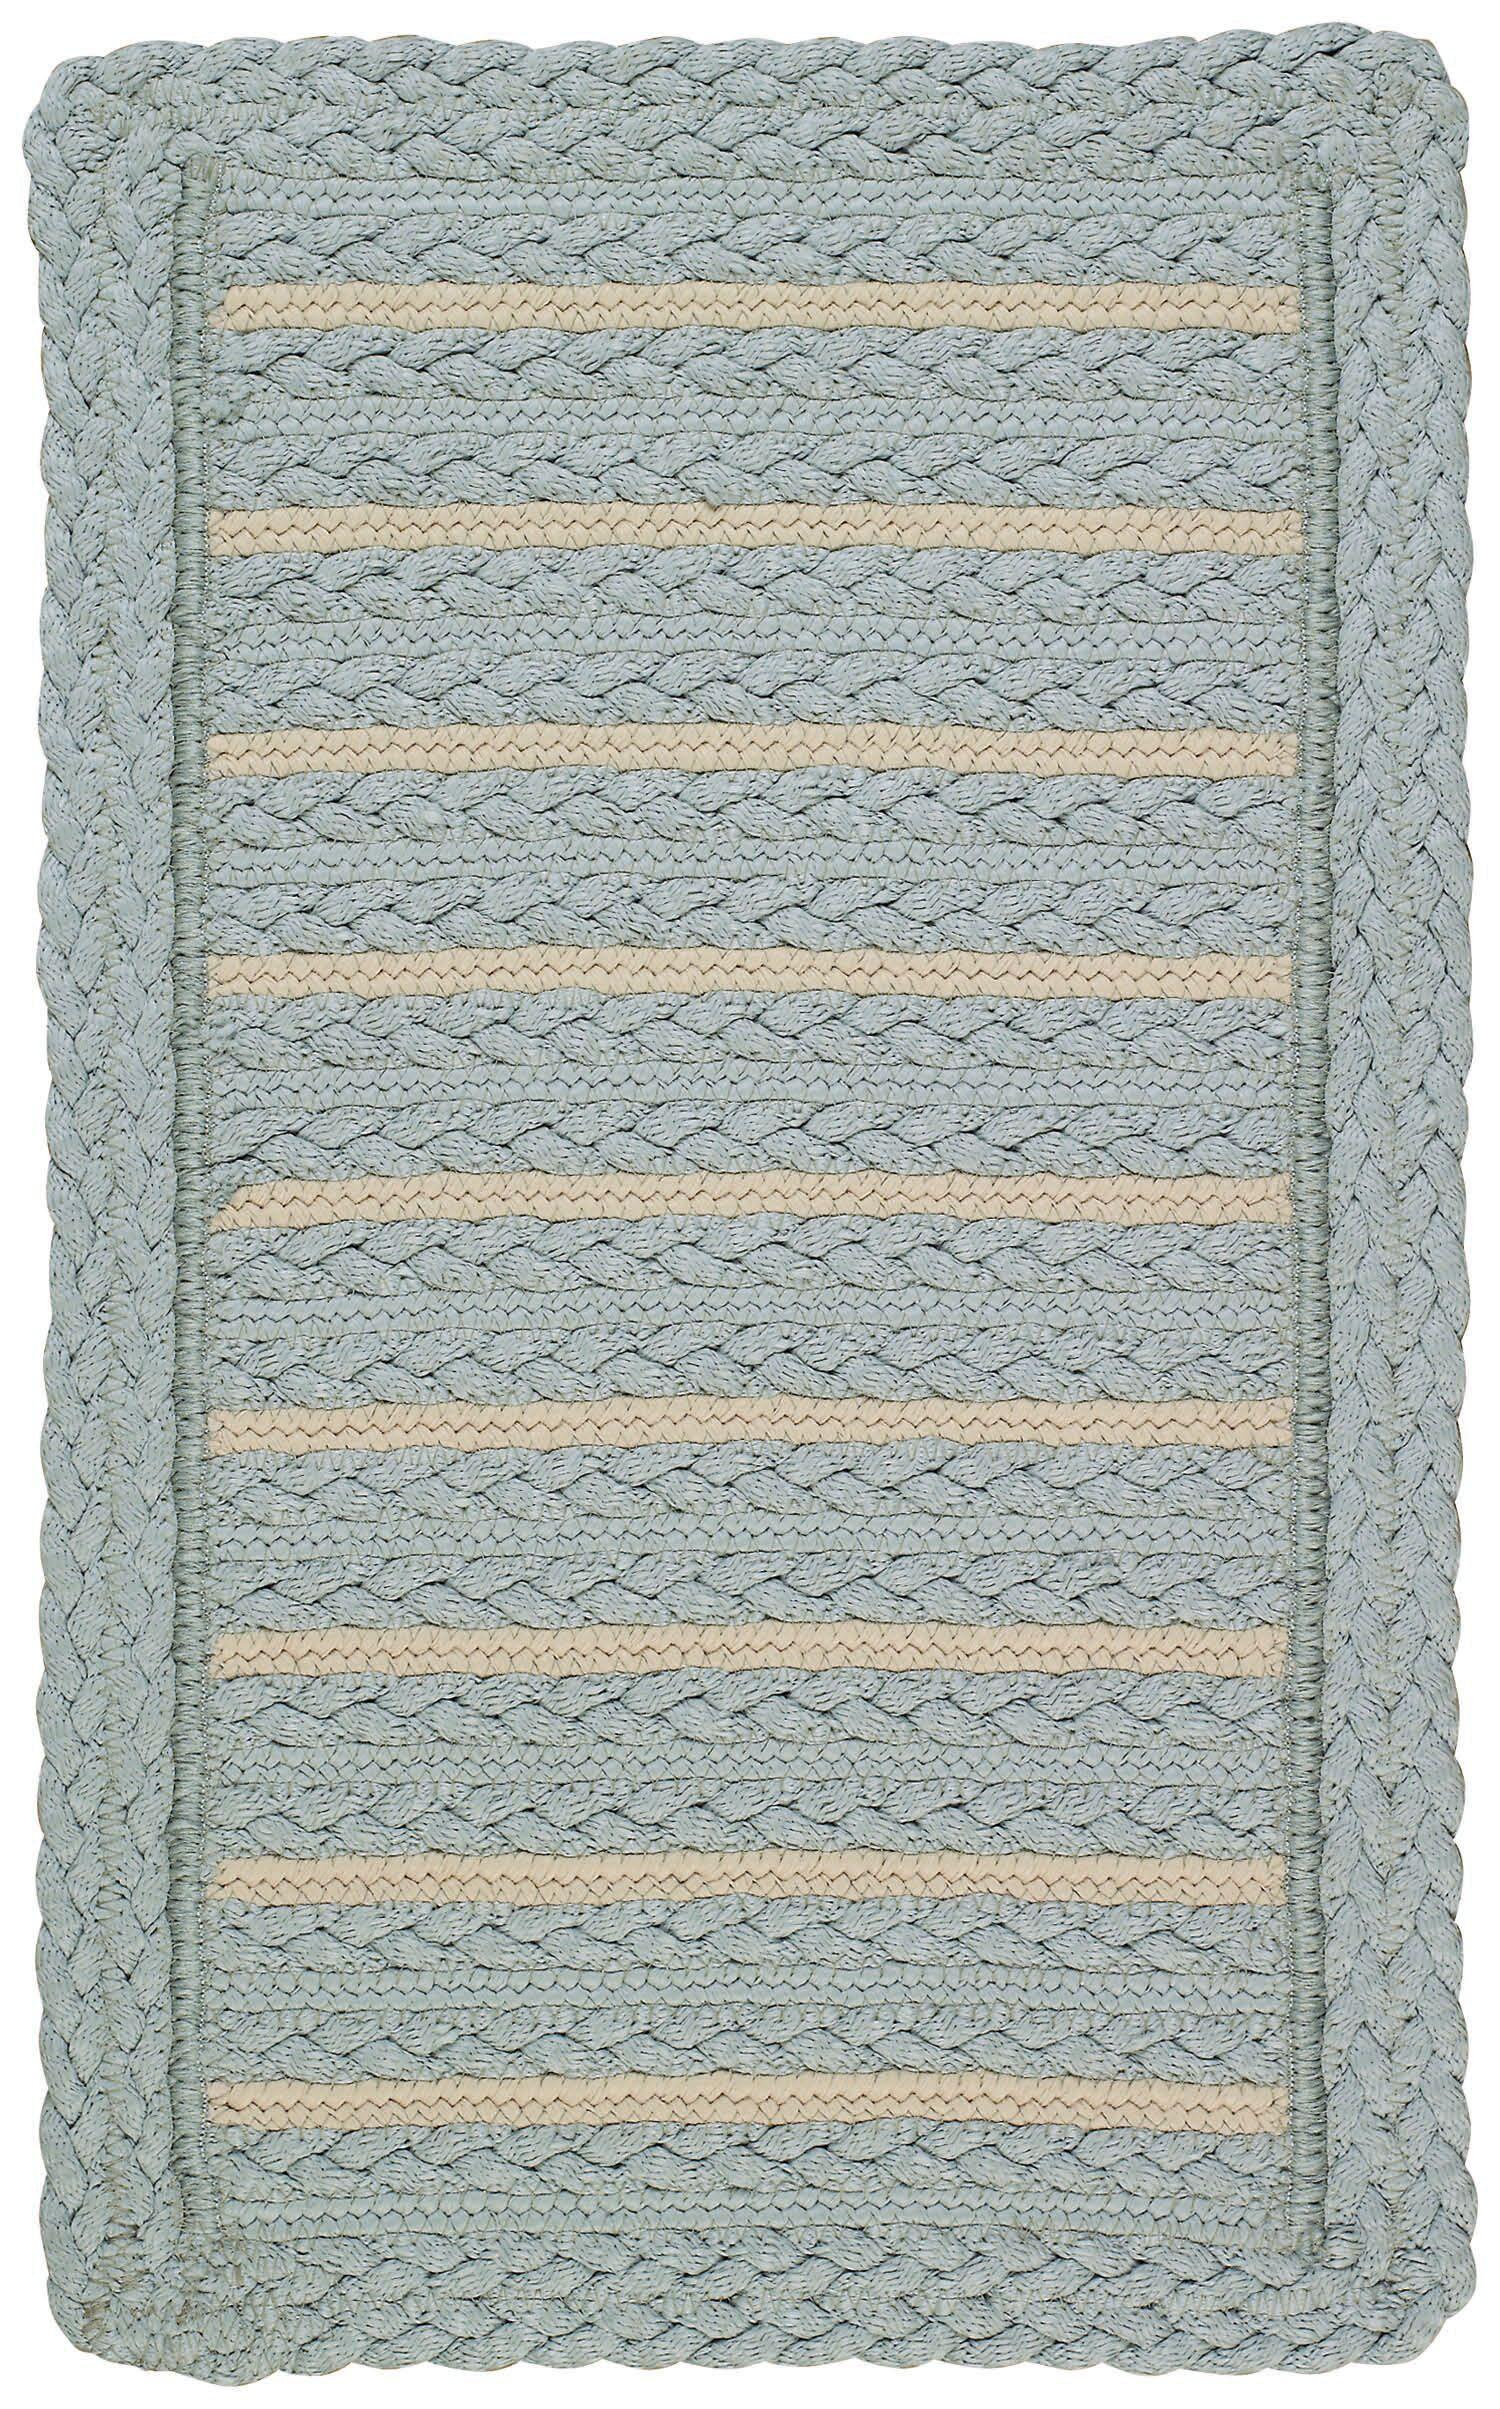 Lyndon Blue Area Rug Rug Size: Cross Sewn Square 5'6